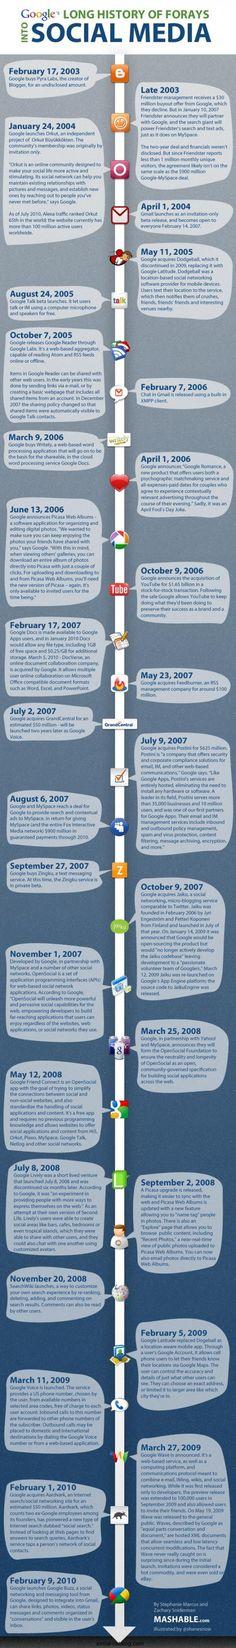 Google e i social media: l'infografica che racconta la storia di Google e del mondo social #fb #smm